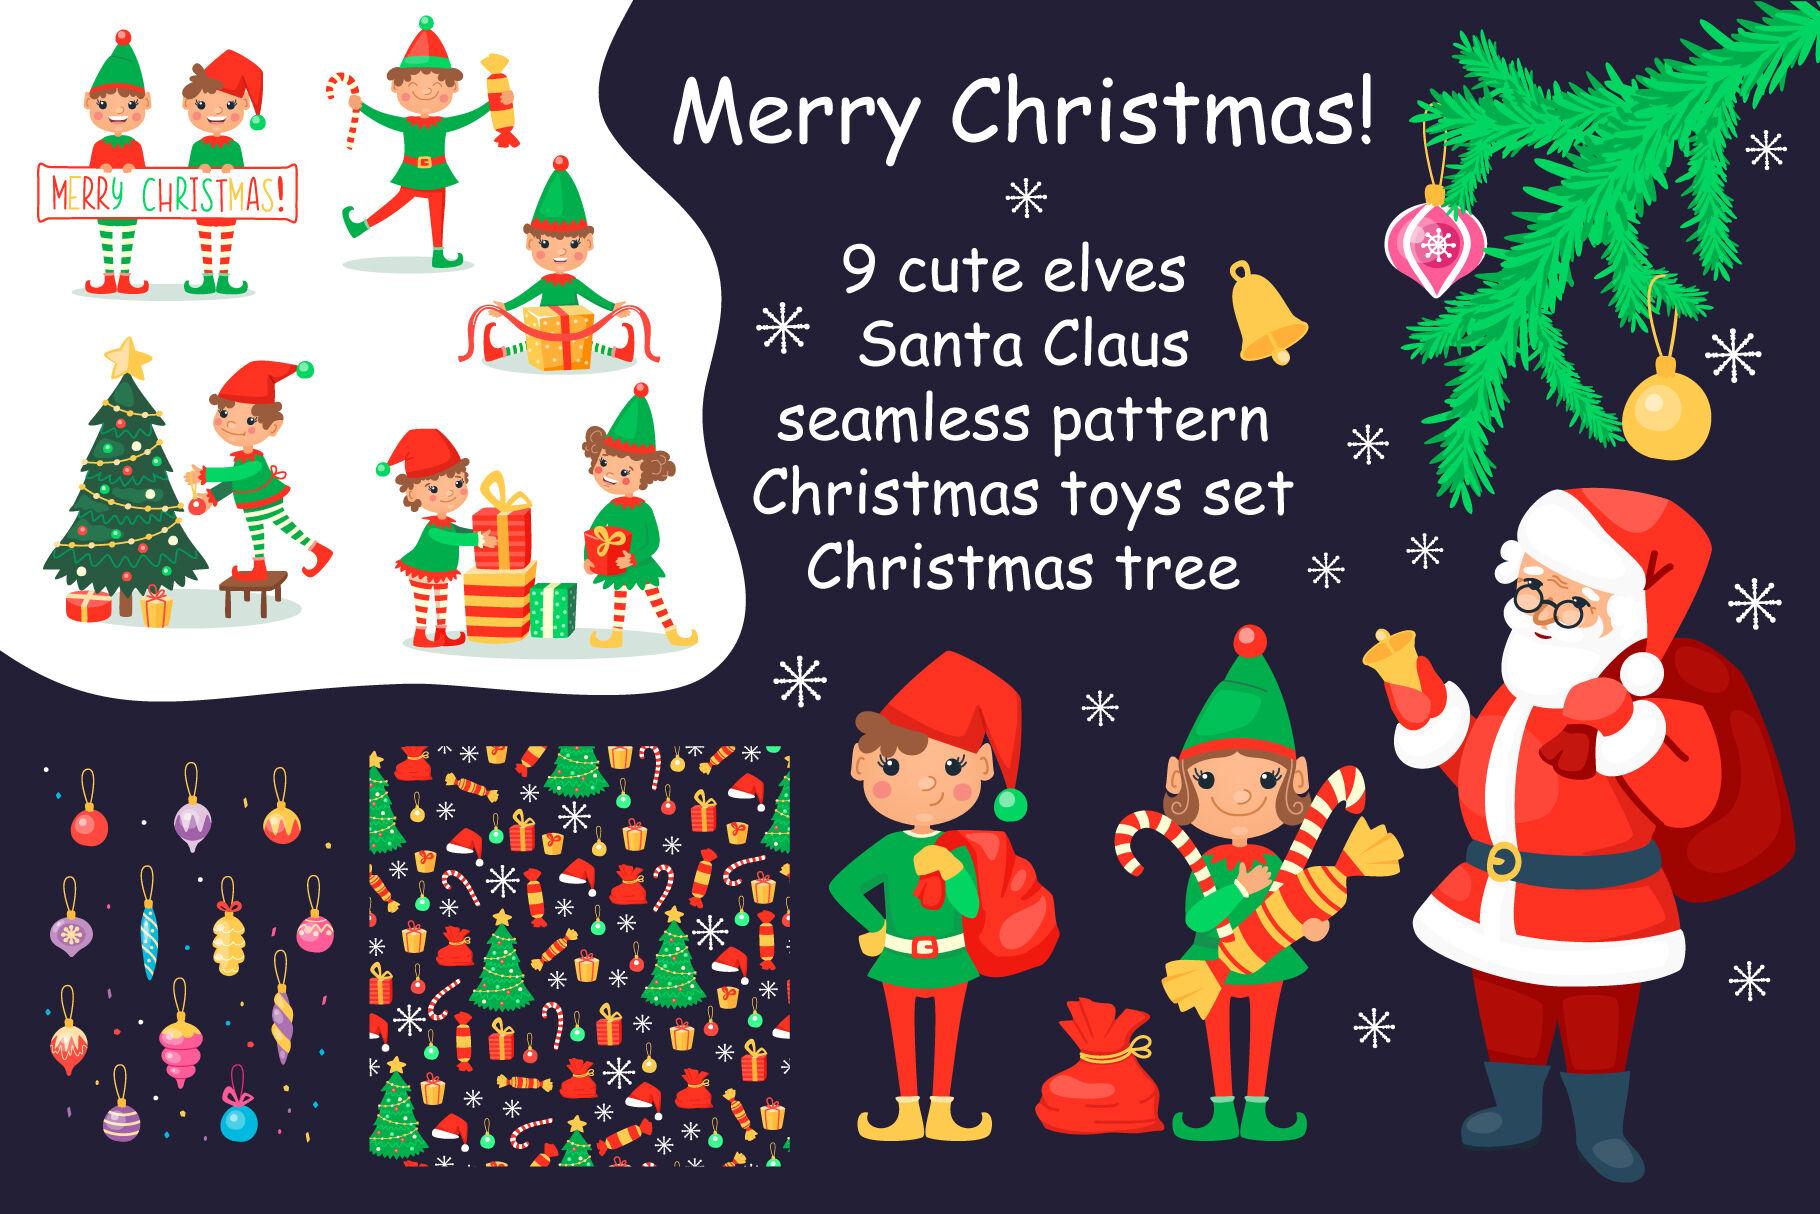 Christmas Cartoon Set With Elves And Santa Clause By Nesterova S